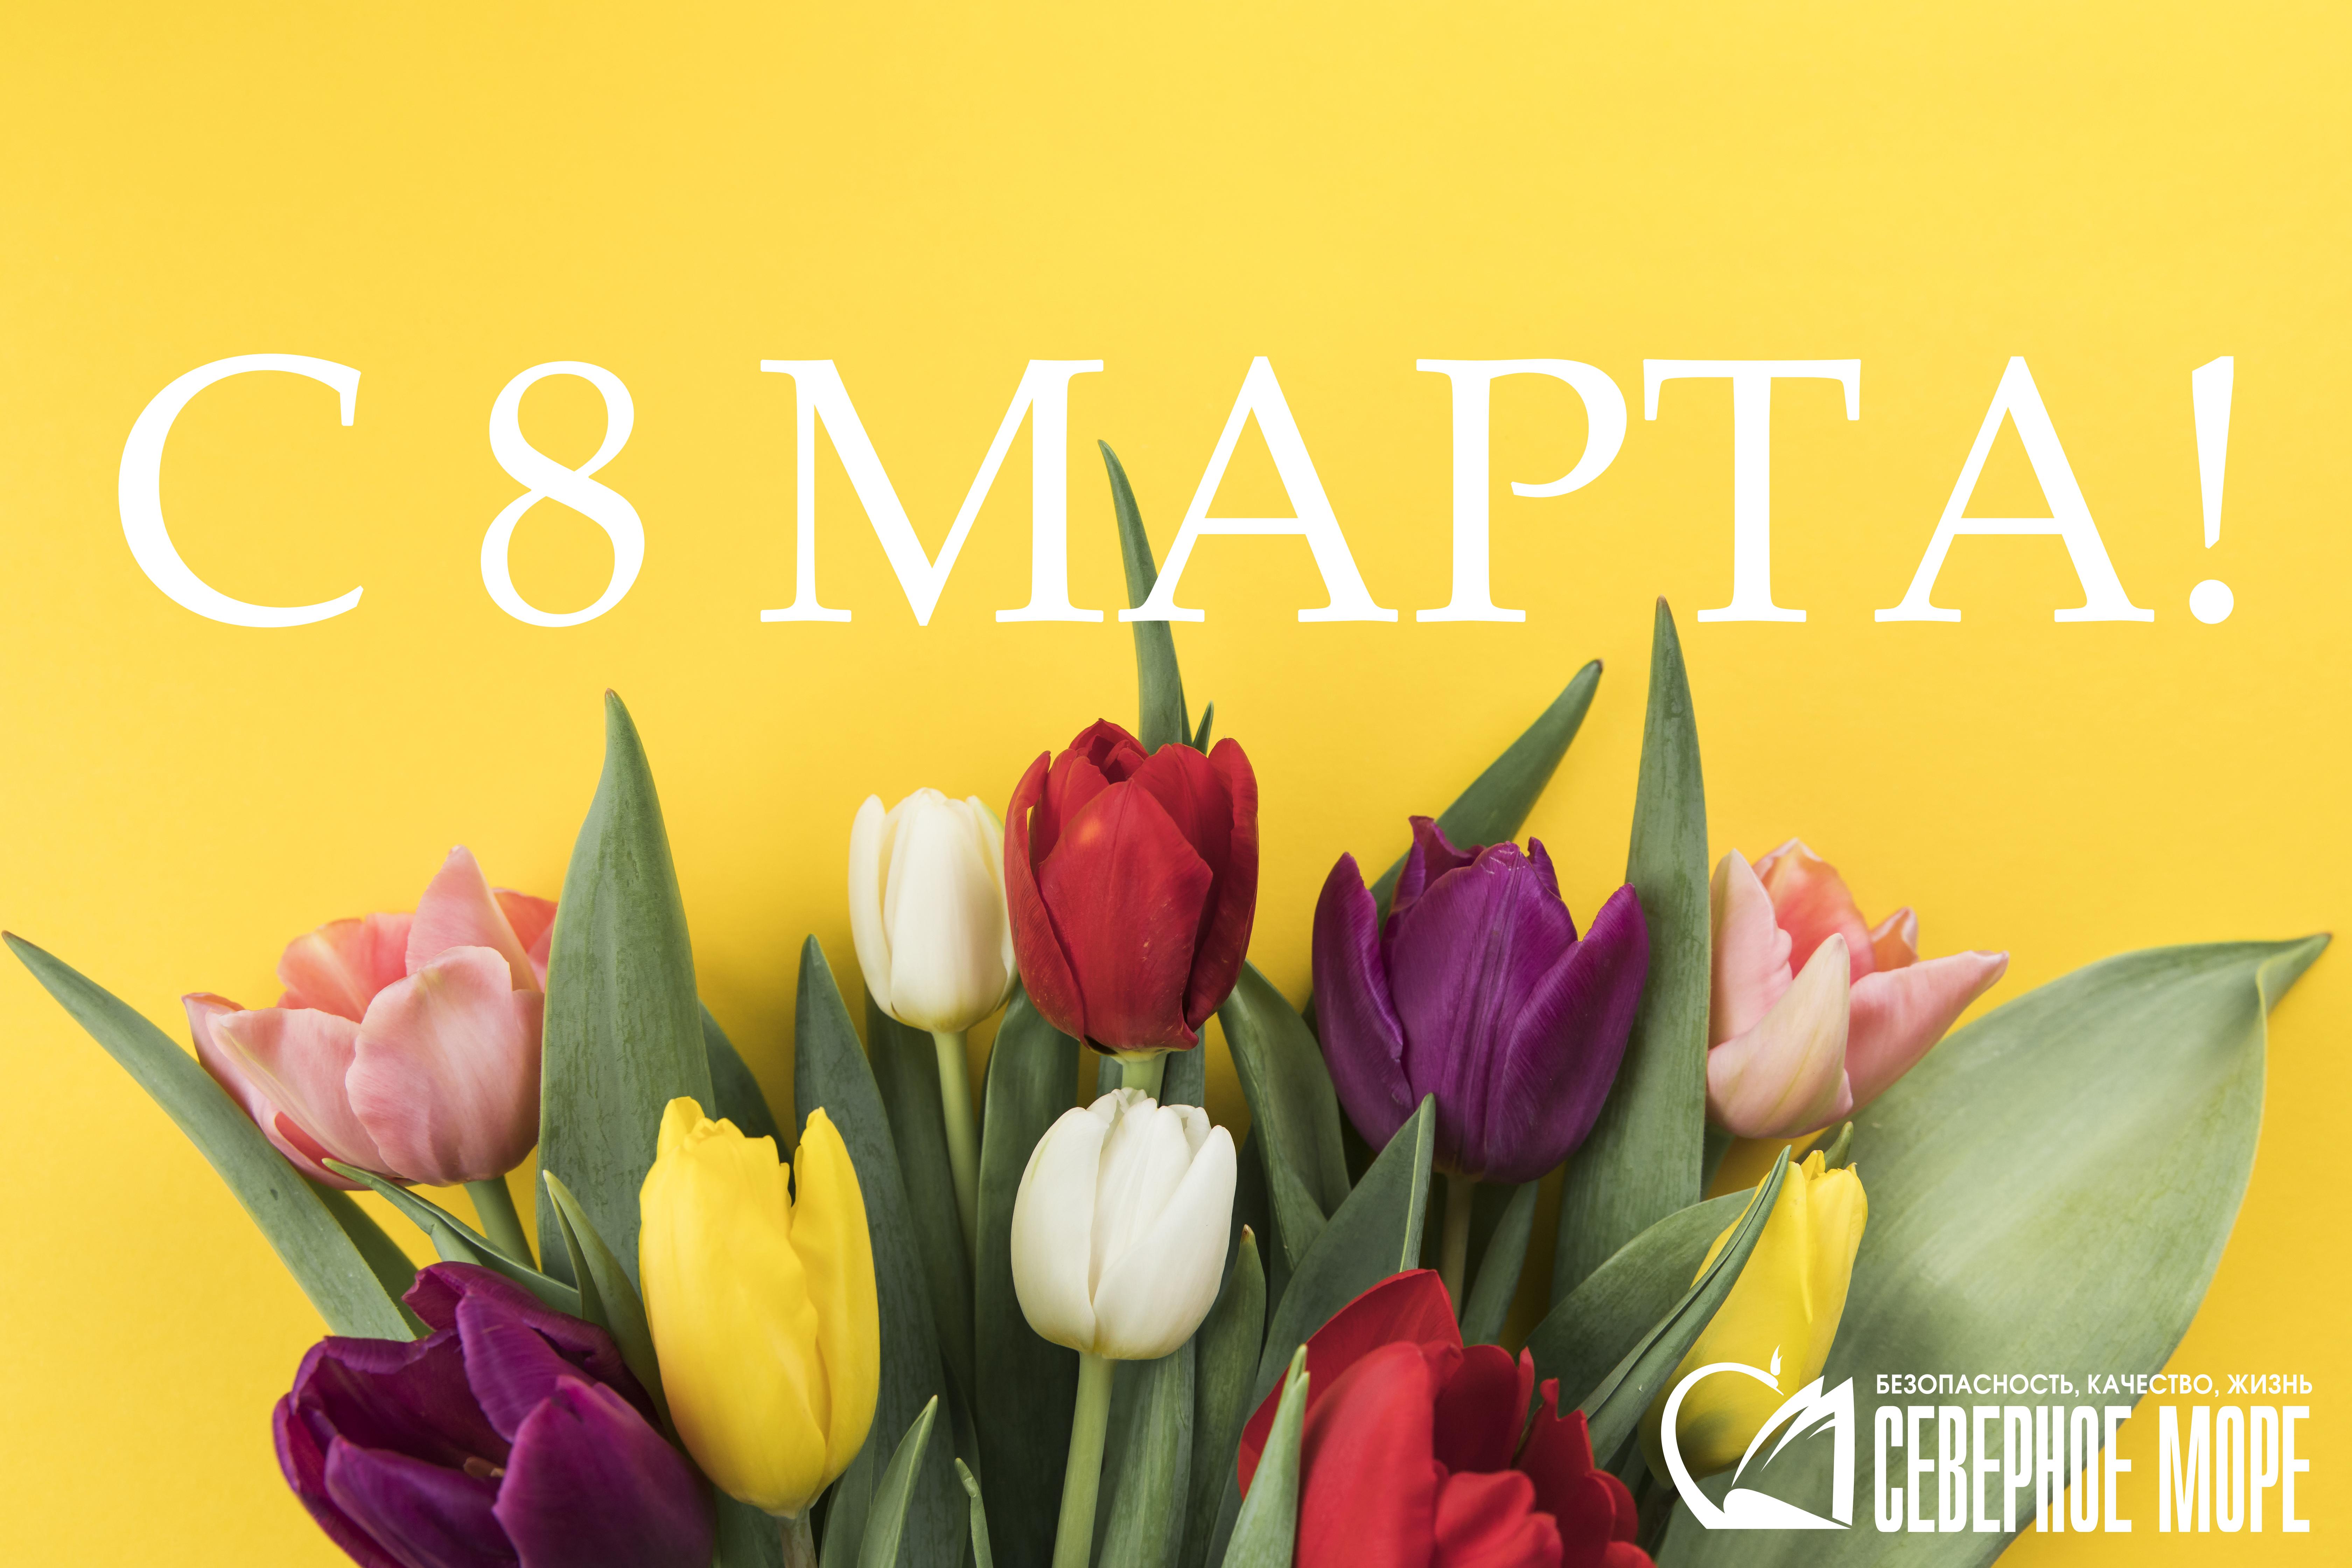 открытка 8 марта северное море